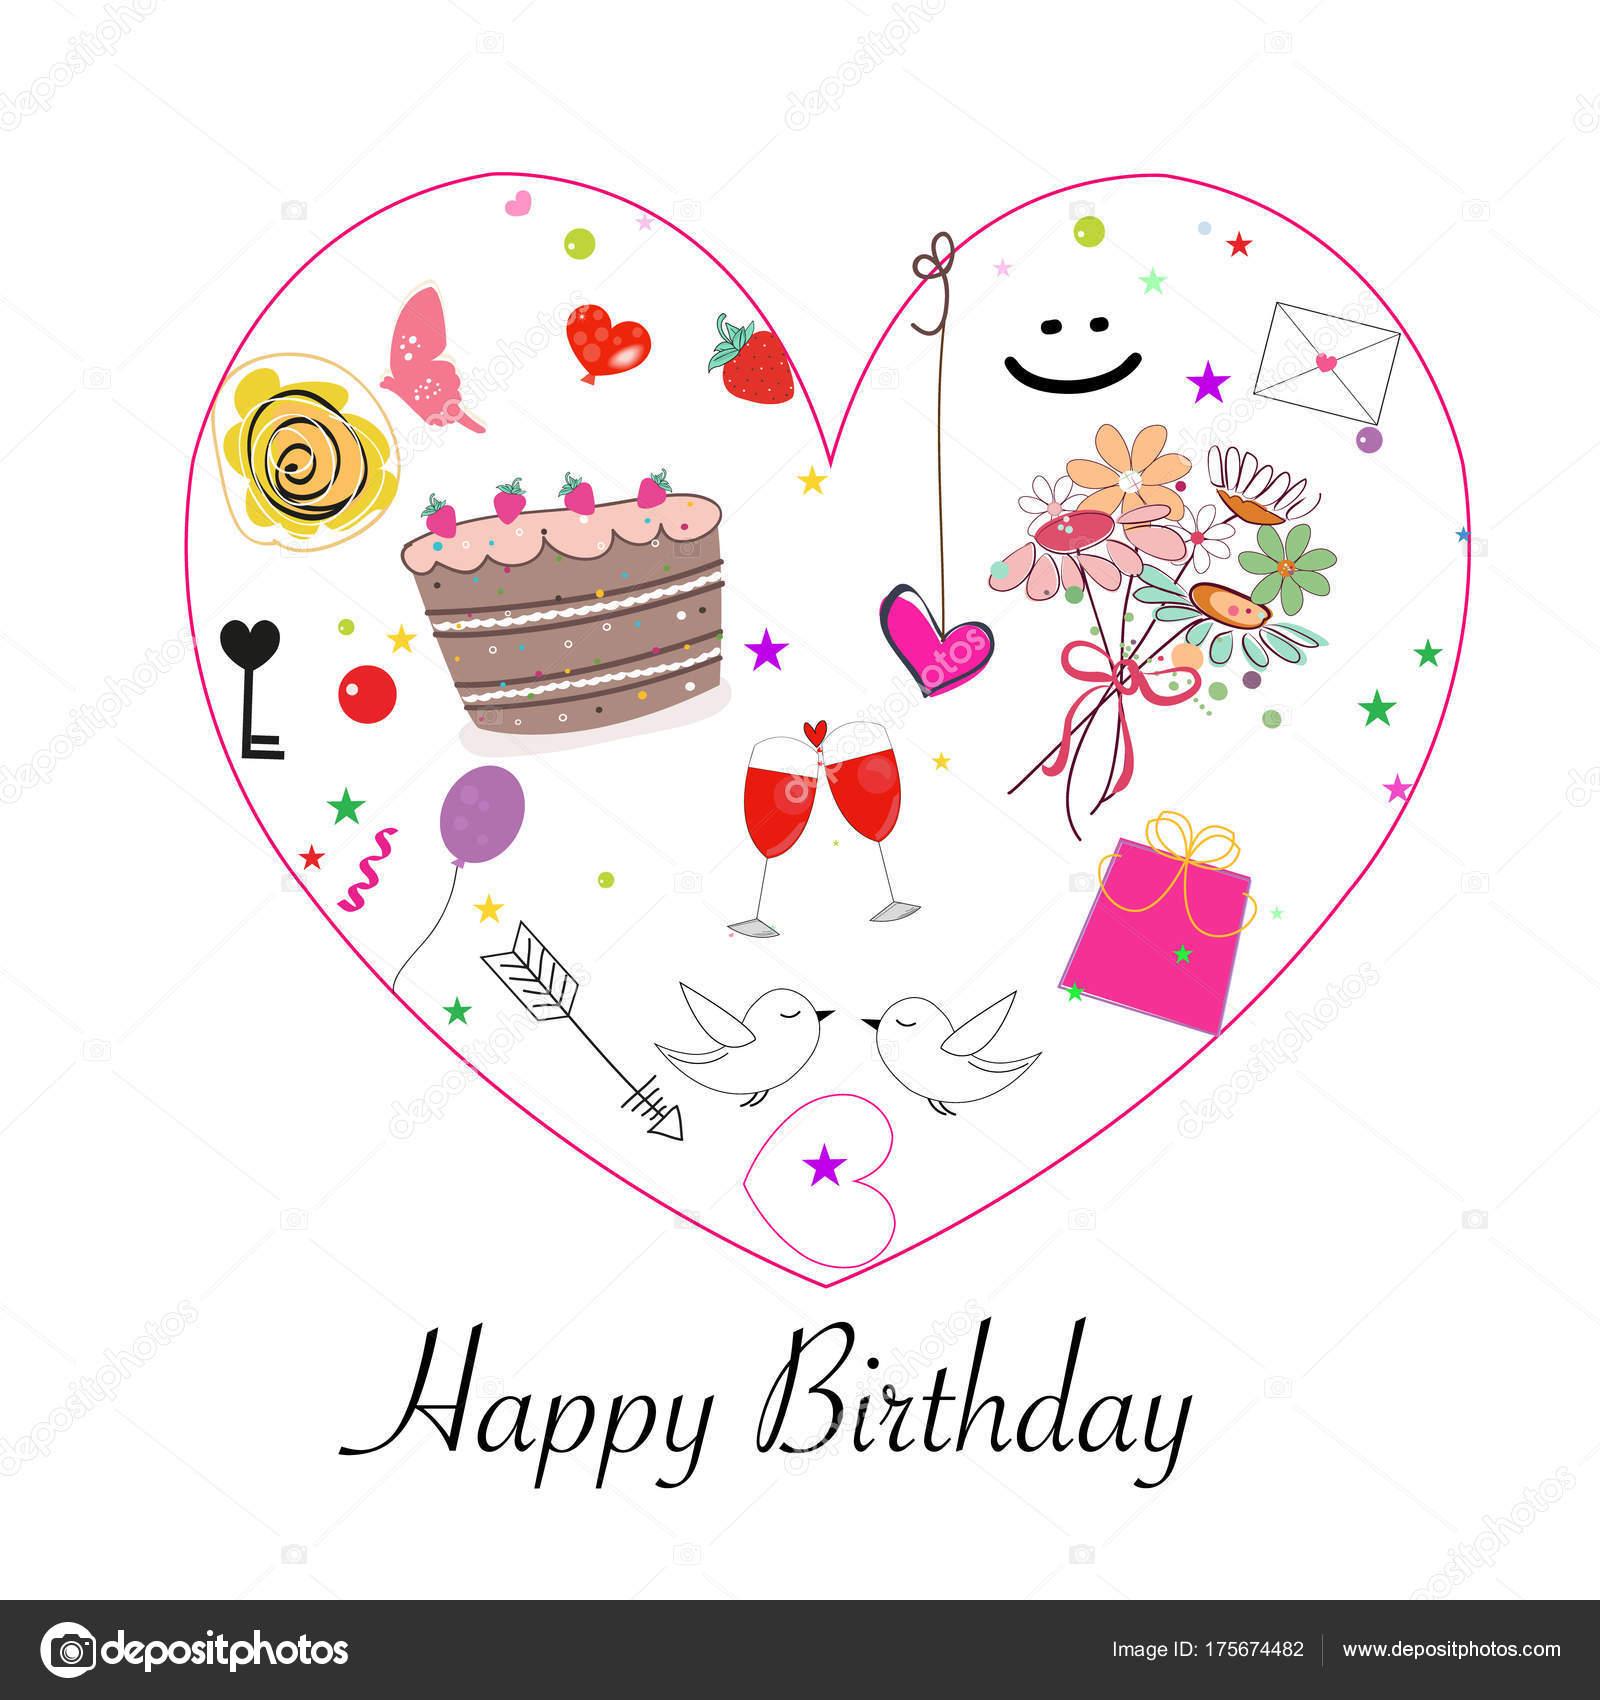 Happy Birthday Greeting Card Cake Flowers Balloon Love Wine Gift